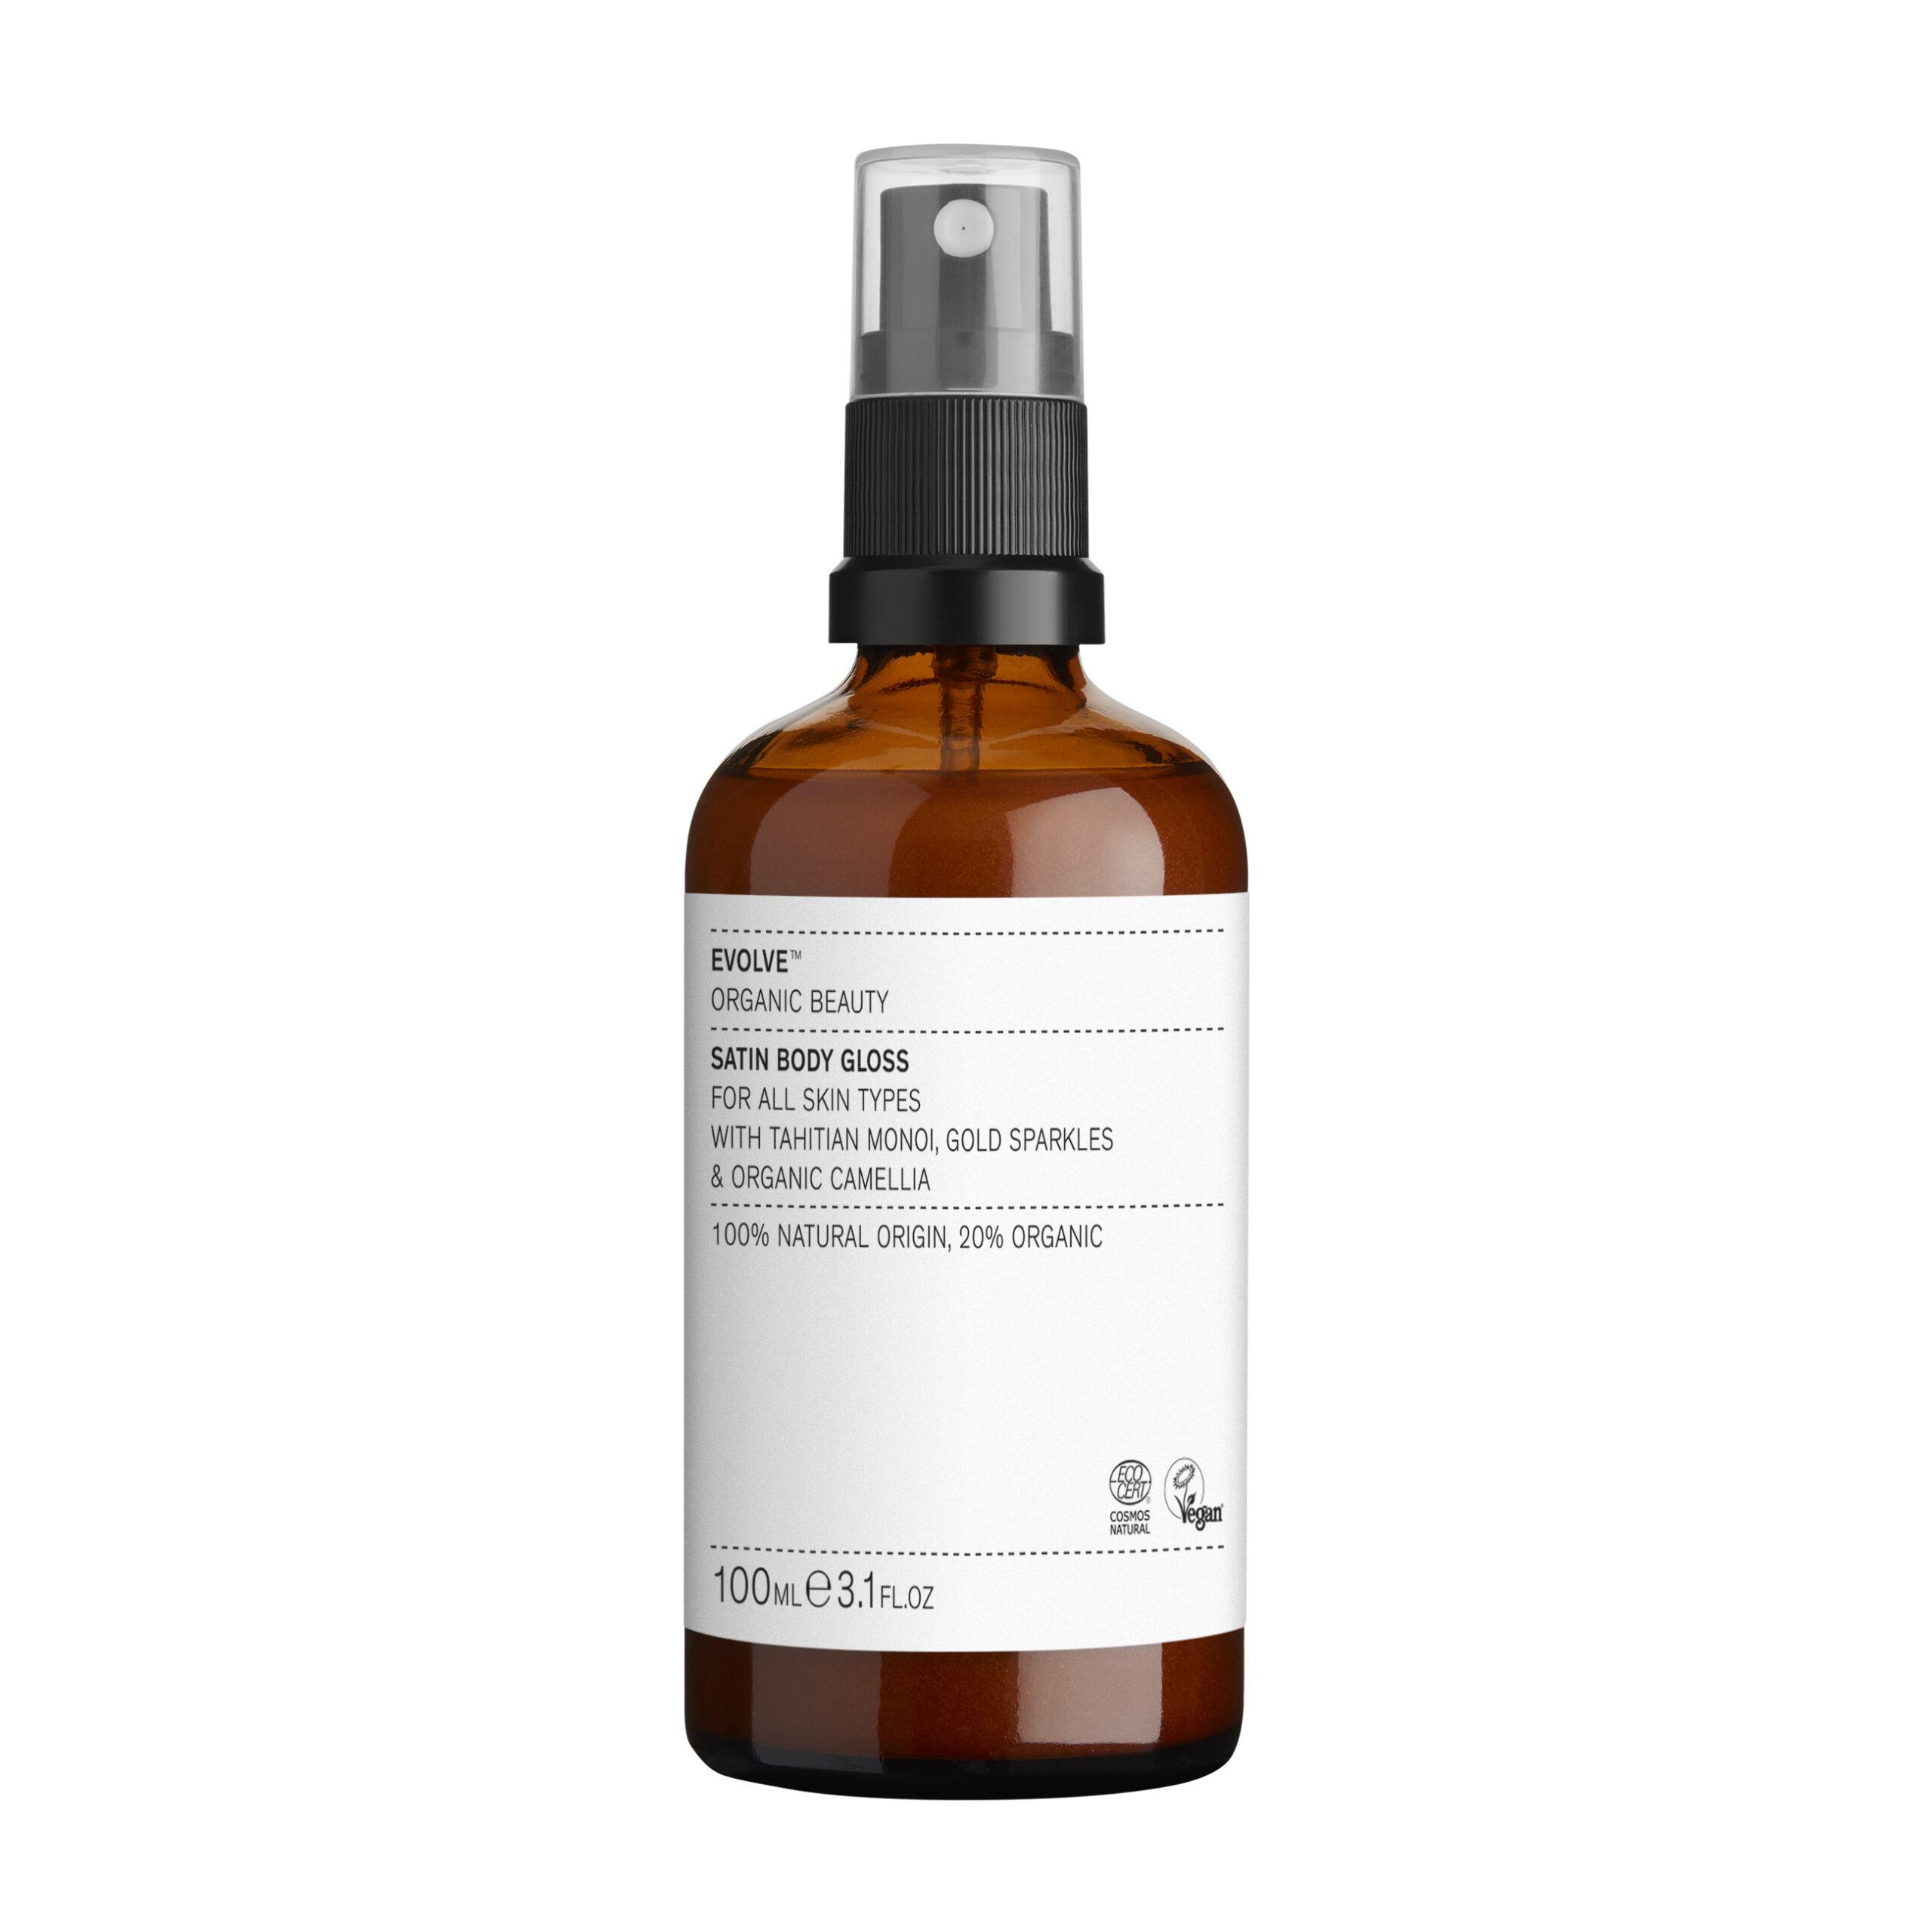 Satin Body Gloss – Evolve Beauty